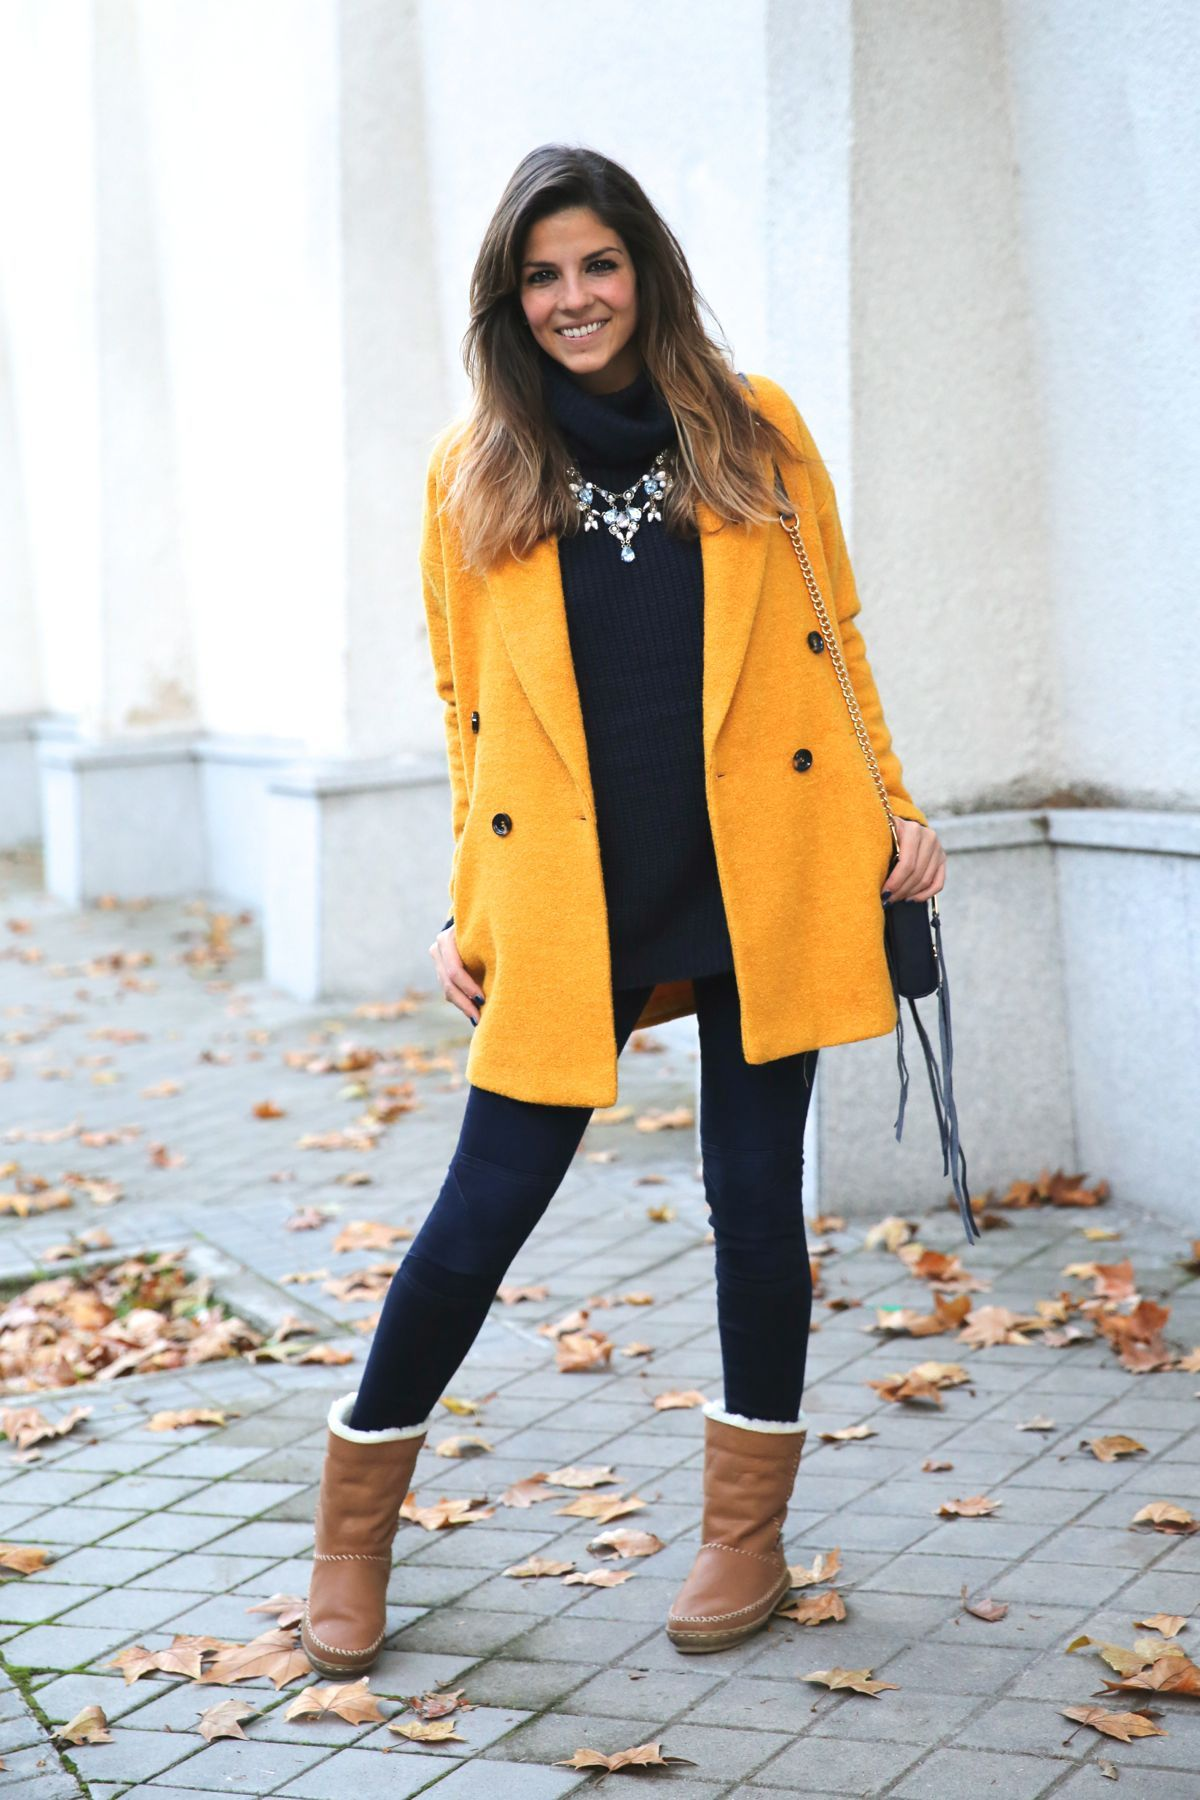 Abrigo/Coat: Fashion Pills (AW 15) Vaqueros y collar/Jeans and necklace: Zara (Old) Jersey/Sweater: Fashion Pills (AW 15) Botas/Boots: Vogue LV (AW 15) Bolso/Bag: Rebecca Minkoff via Sarenza.es